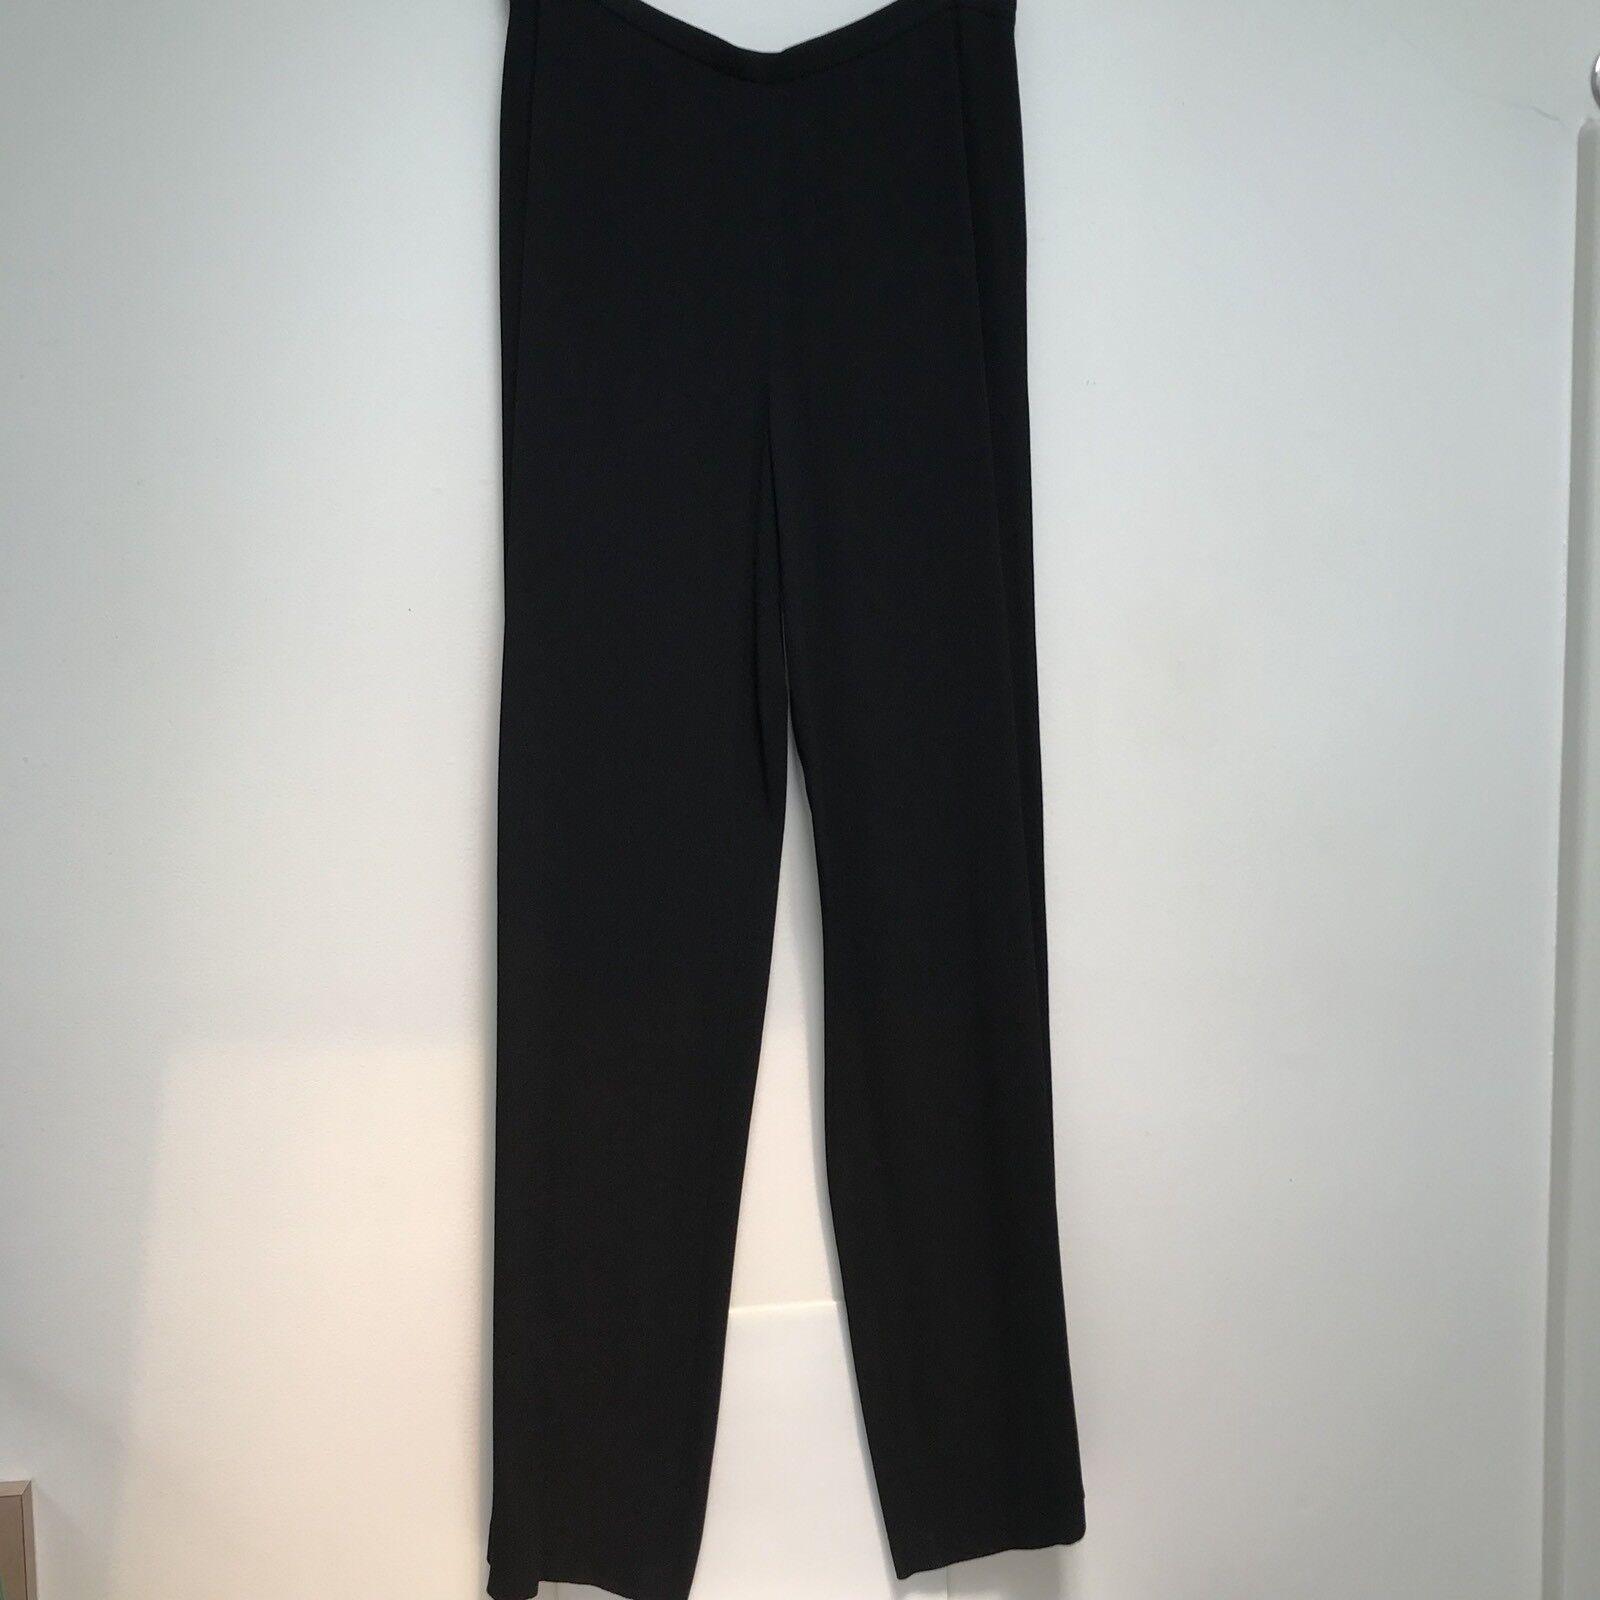 GIANFRANCO FERRE schwarz evening pants Wide Leg  Flat Front 10